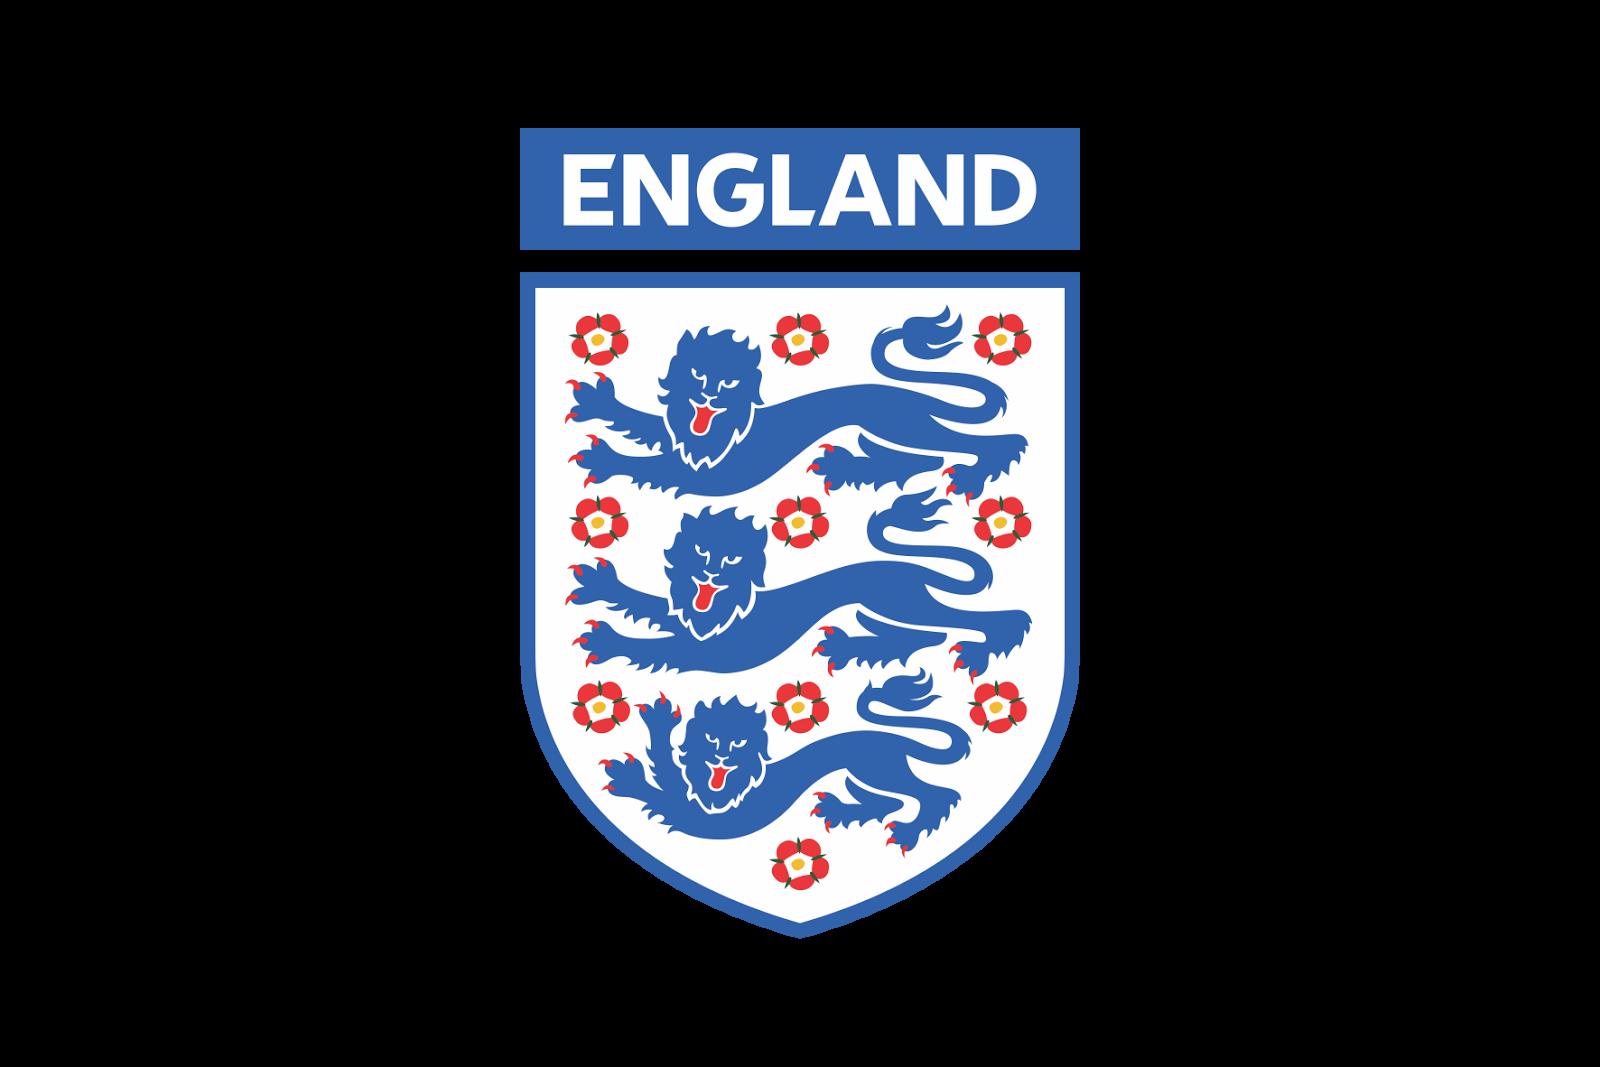 England National Football Team Vector PNG - 32688